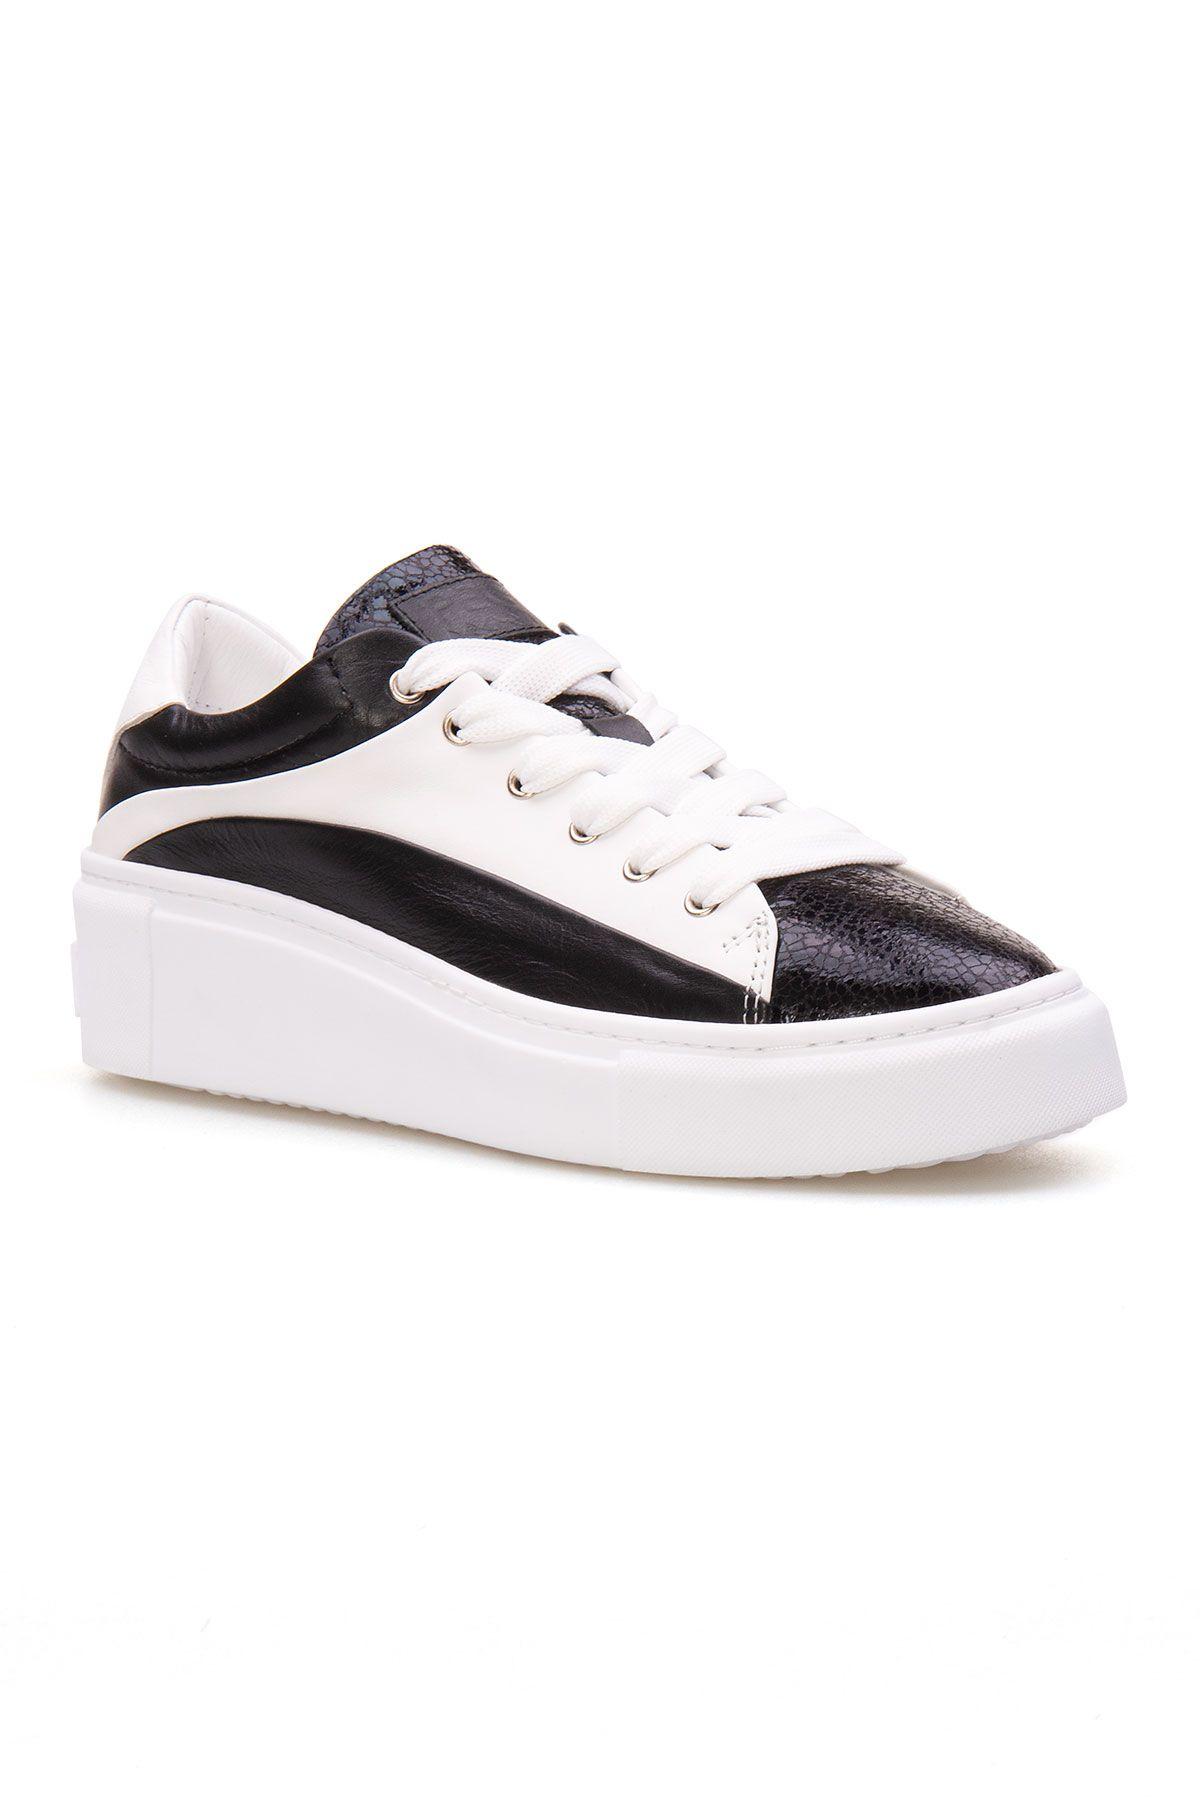 Pegia Hakiki Deri Kadın Sneaker LA1602 Siyah